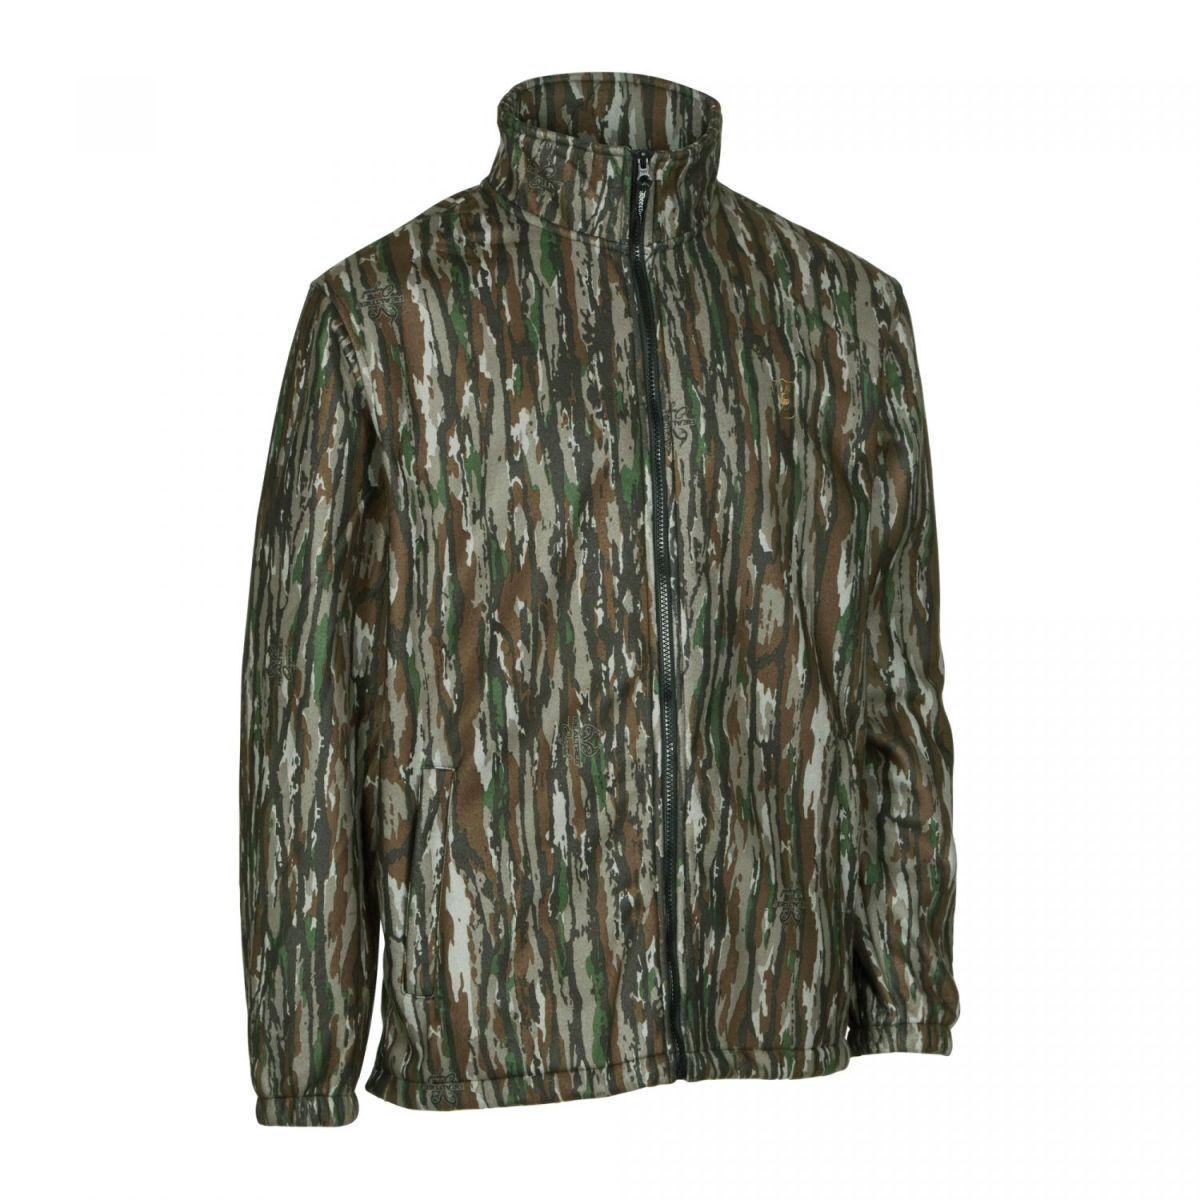 Deerhunter 5598  Avanti Polar chaqueta  86-DH Realtree original camo, talla s